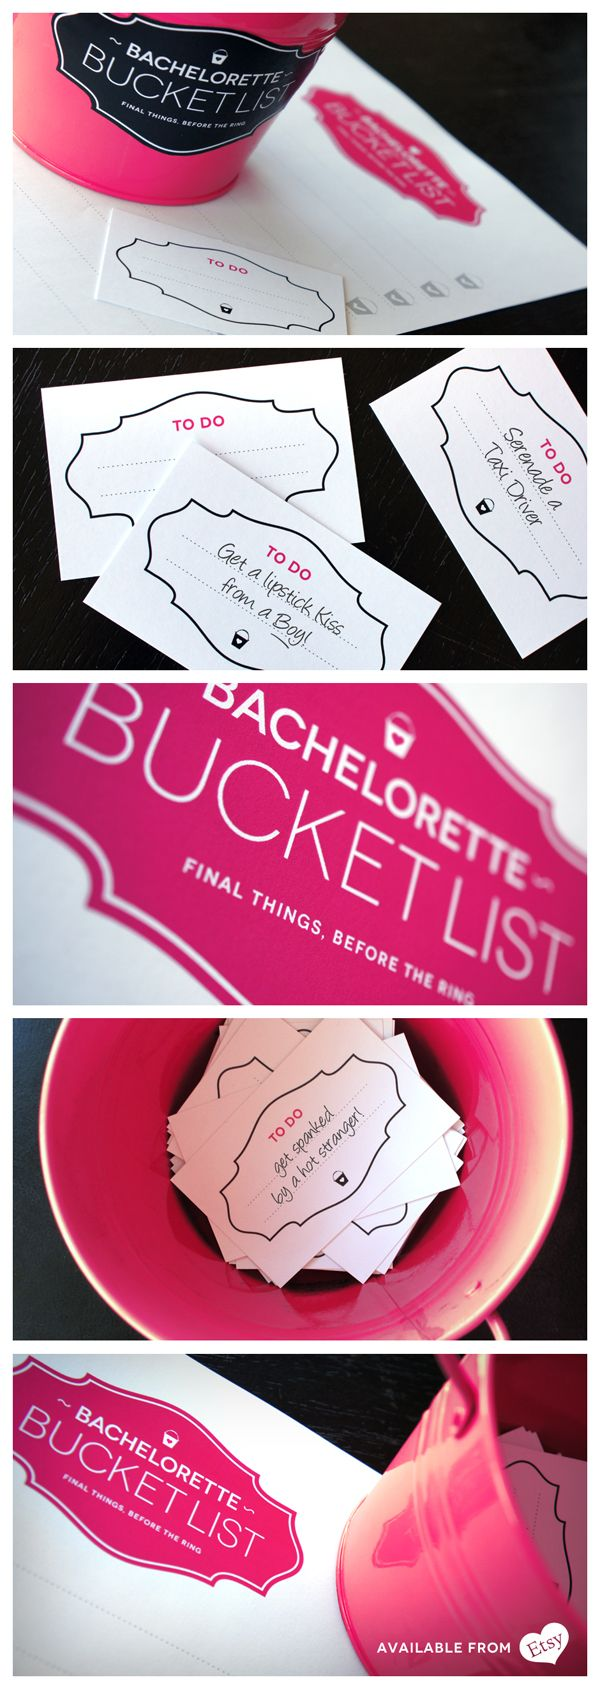 Bachelorette Bucket List - Game #bachelorette #party #idea